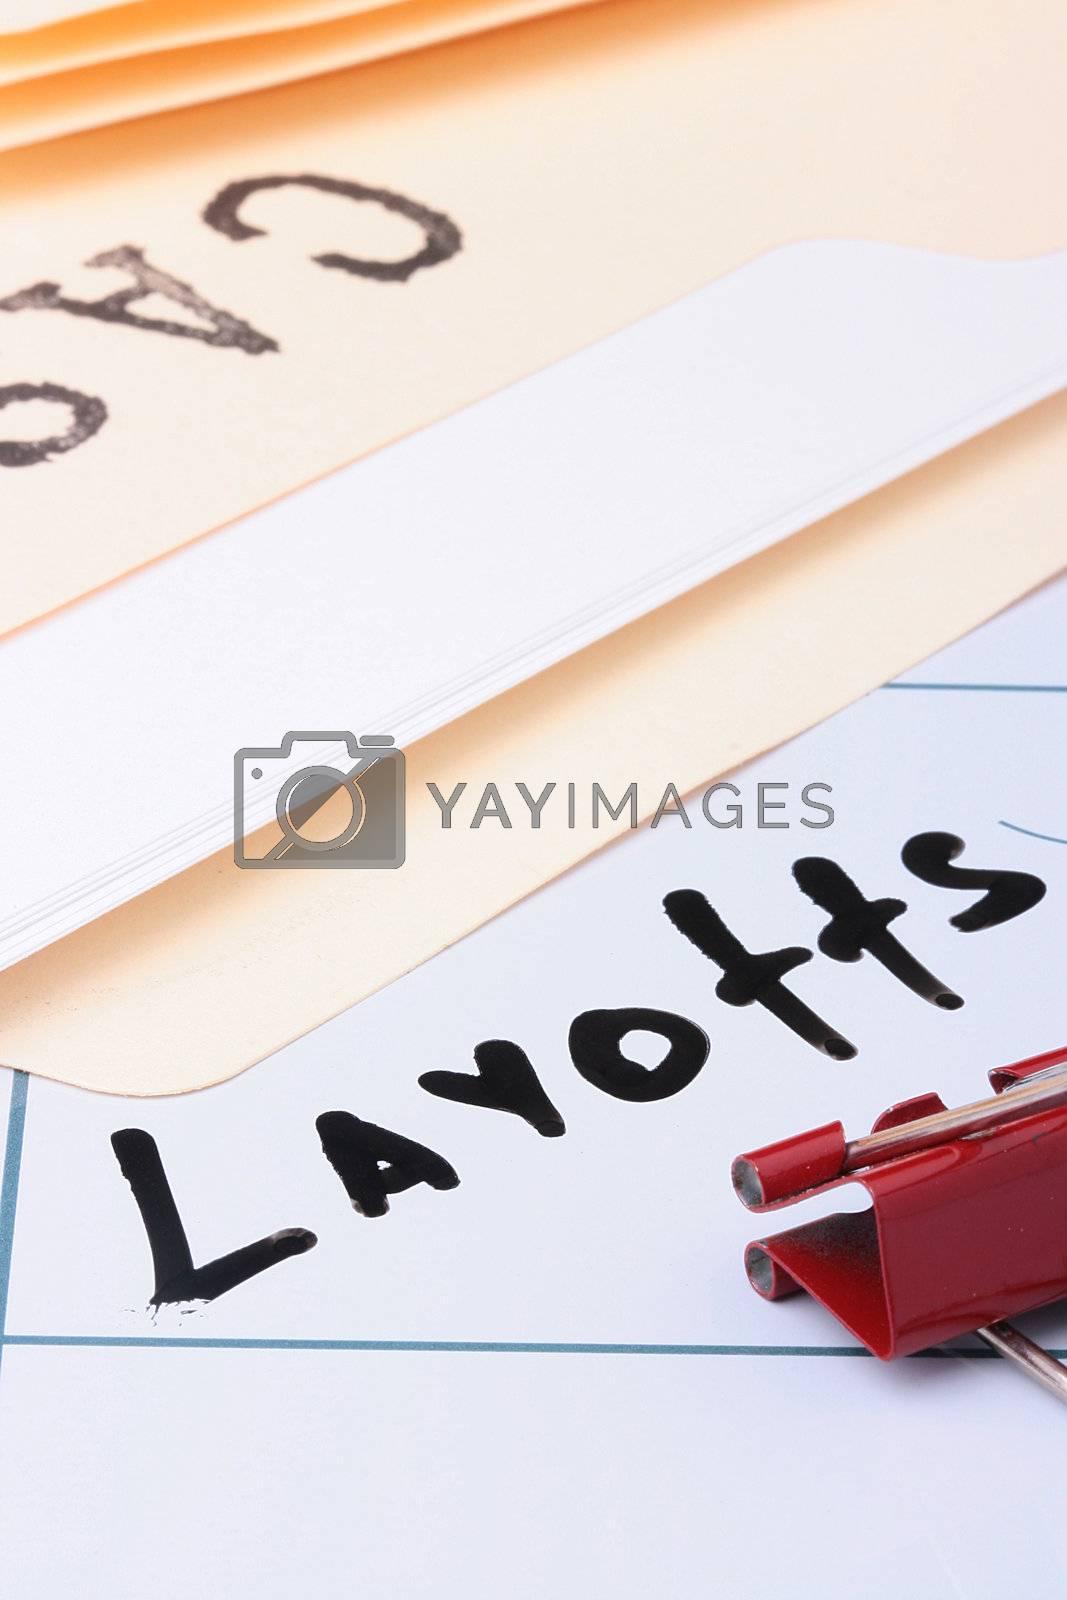 Royalty free image of Layoffs by VIPDesignUSA